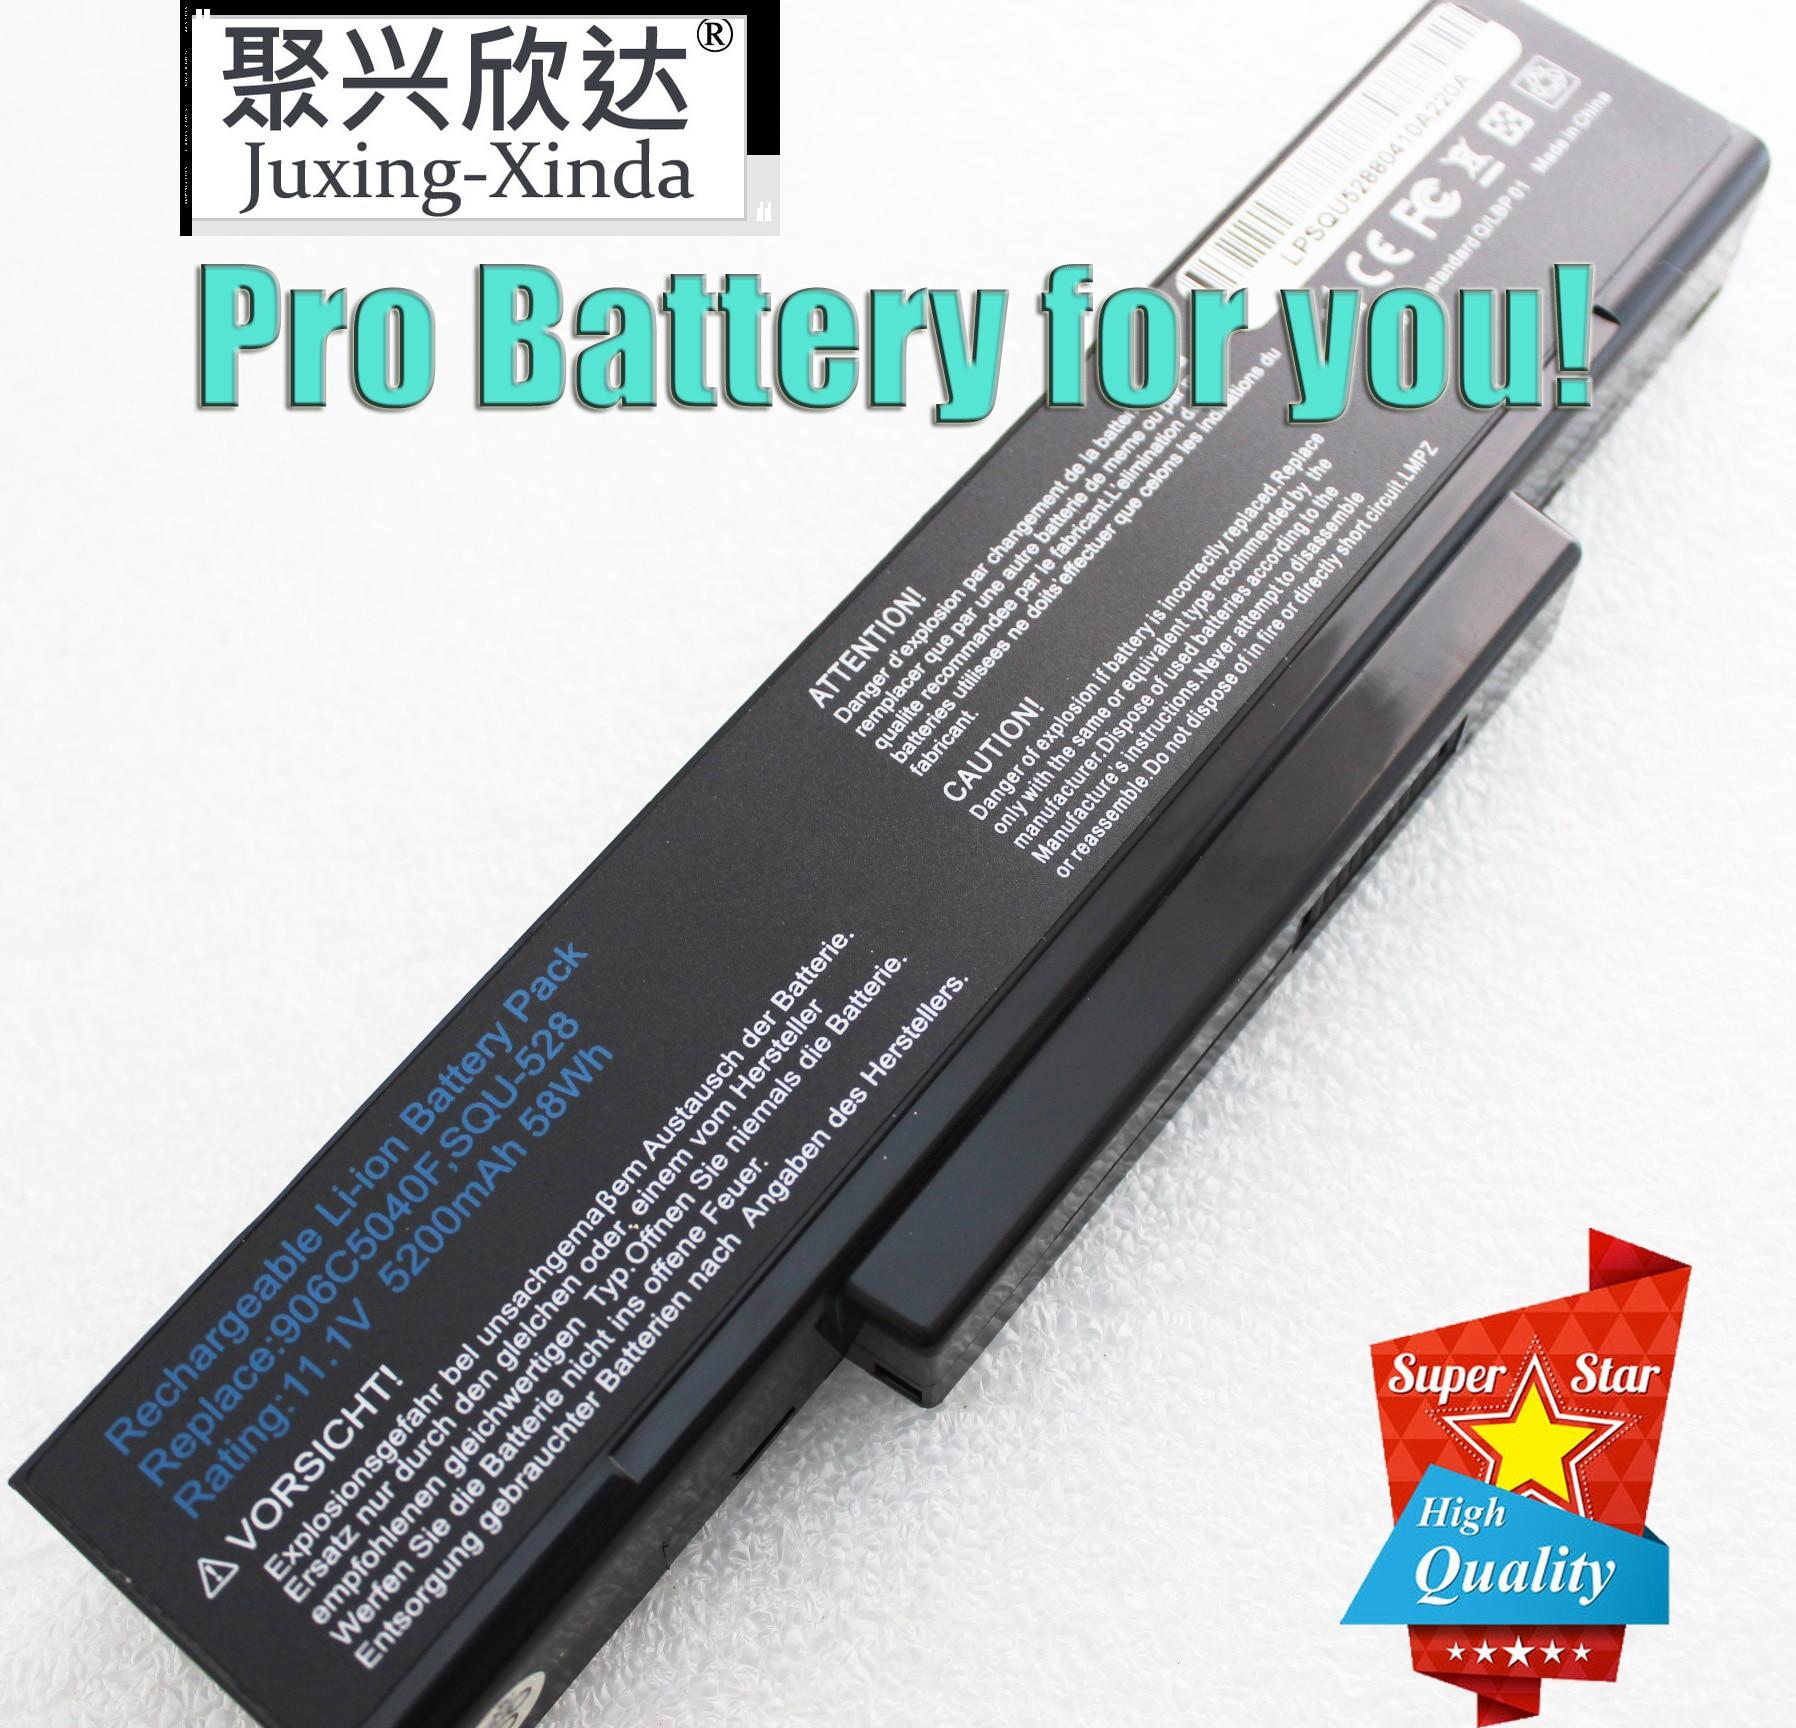 5200MAH Bateria do portátil Para MSI SQU-528 M655 M660 M662 M670 M677 CR400 PR600 PR620 GX400 GX600 GX610 GX620 BTY-M66 Z53 M51 Z94